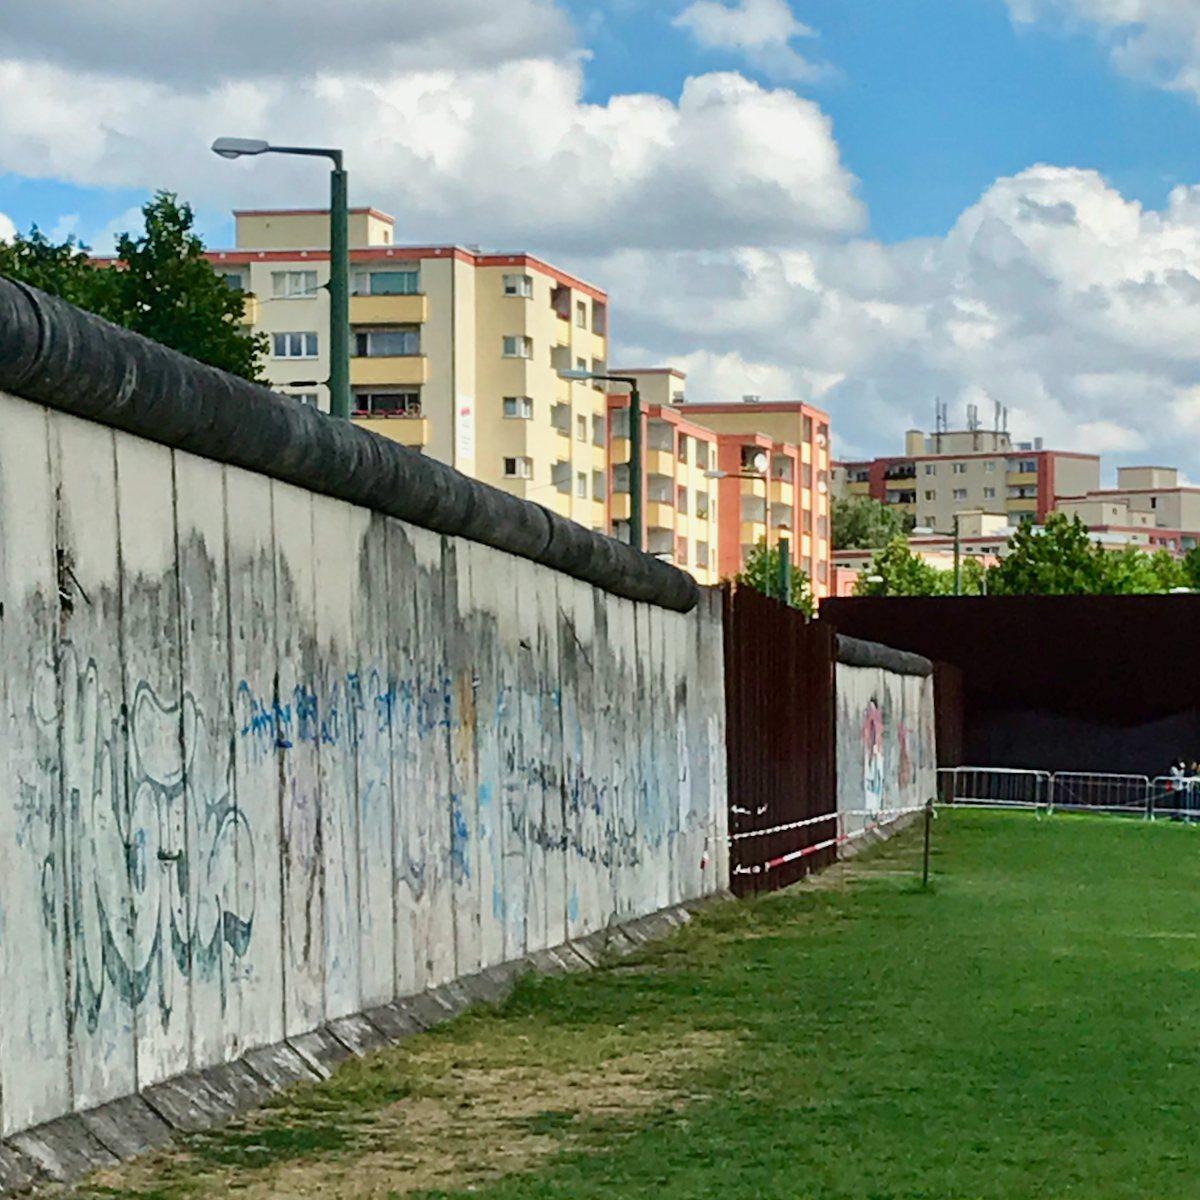 The Berlin Wall Memorial in Germany.